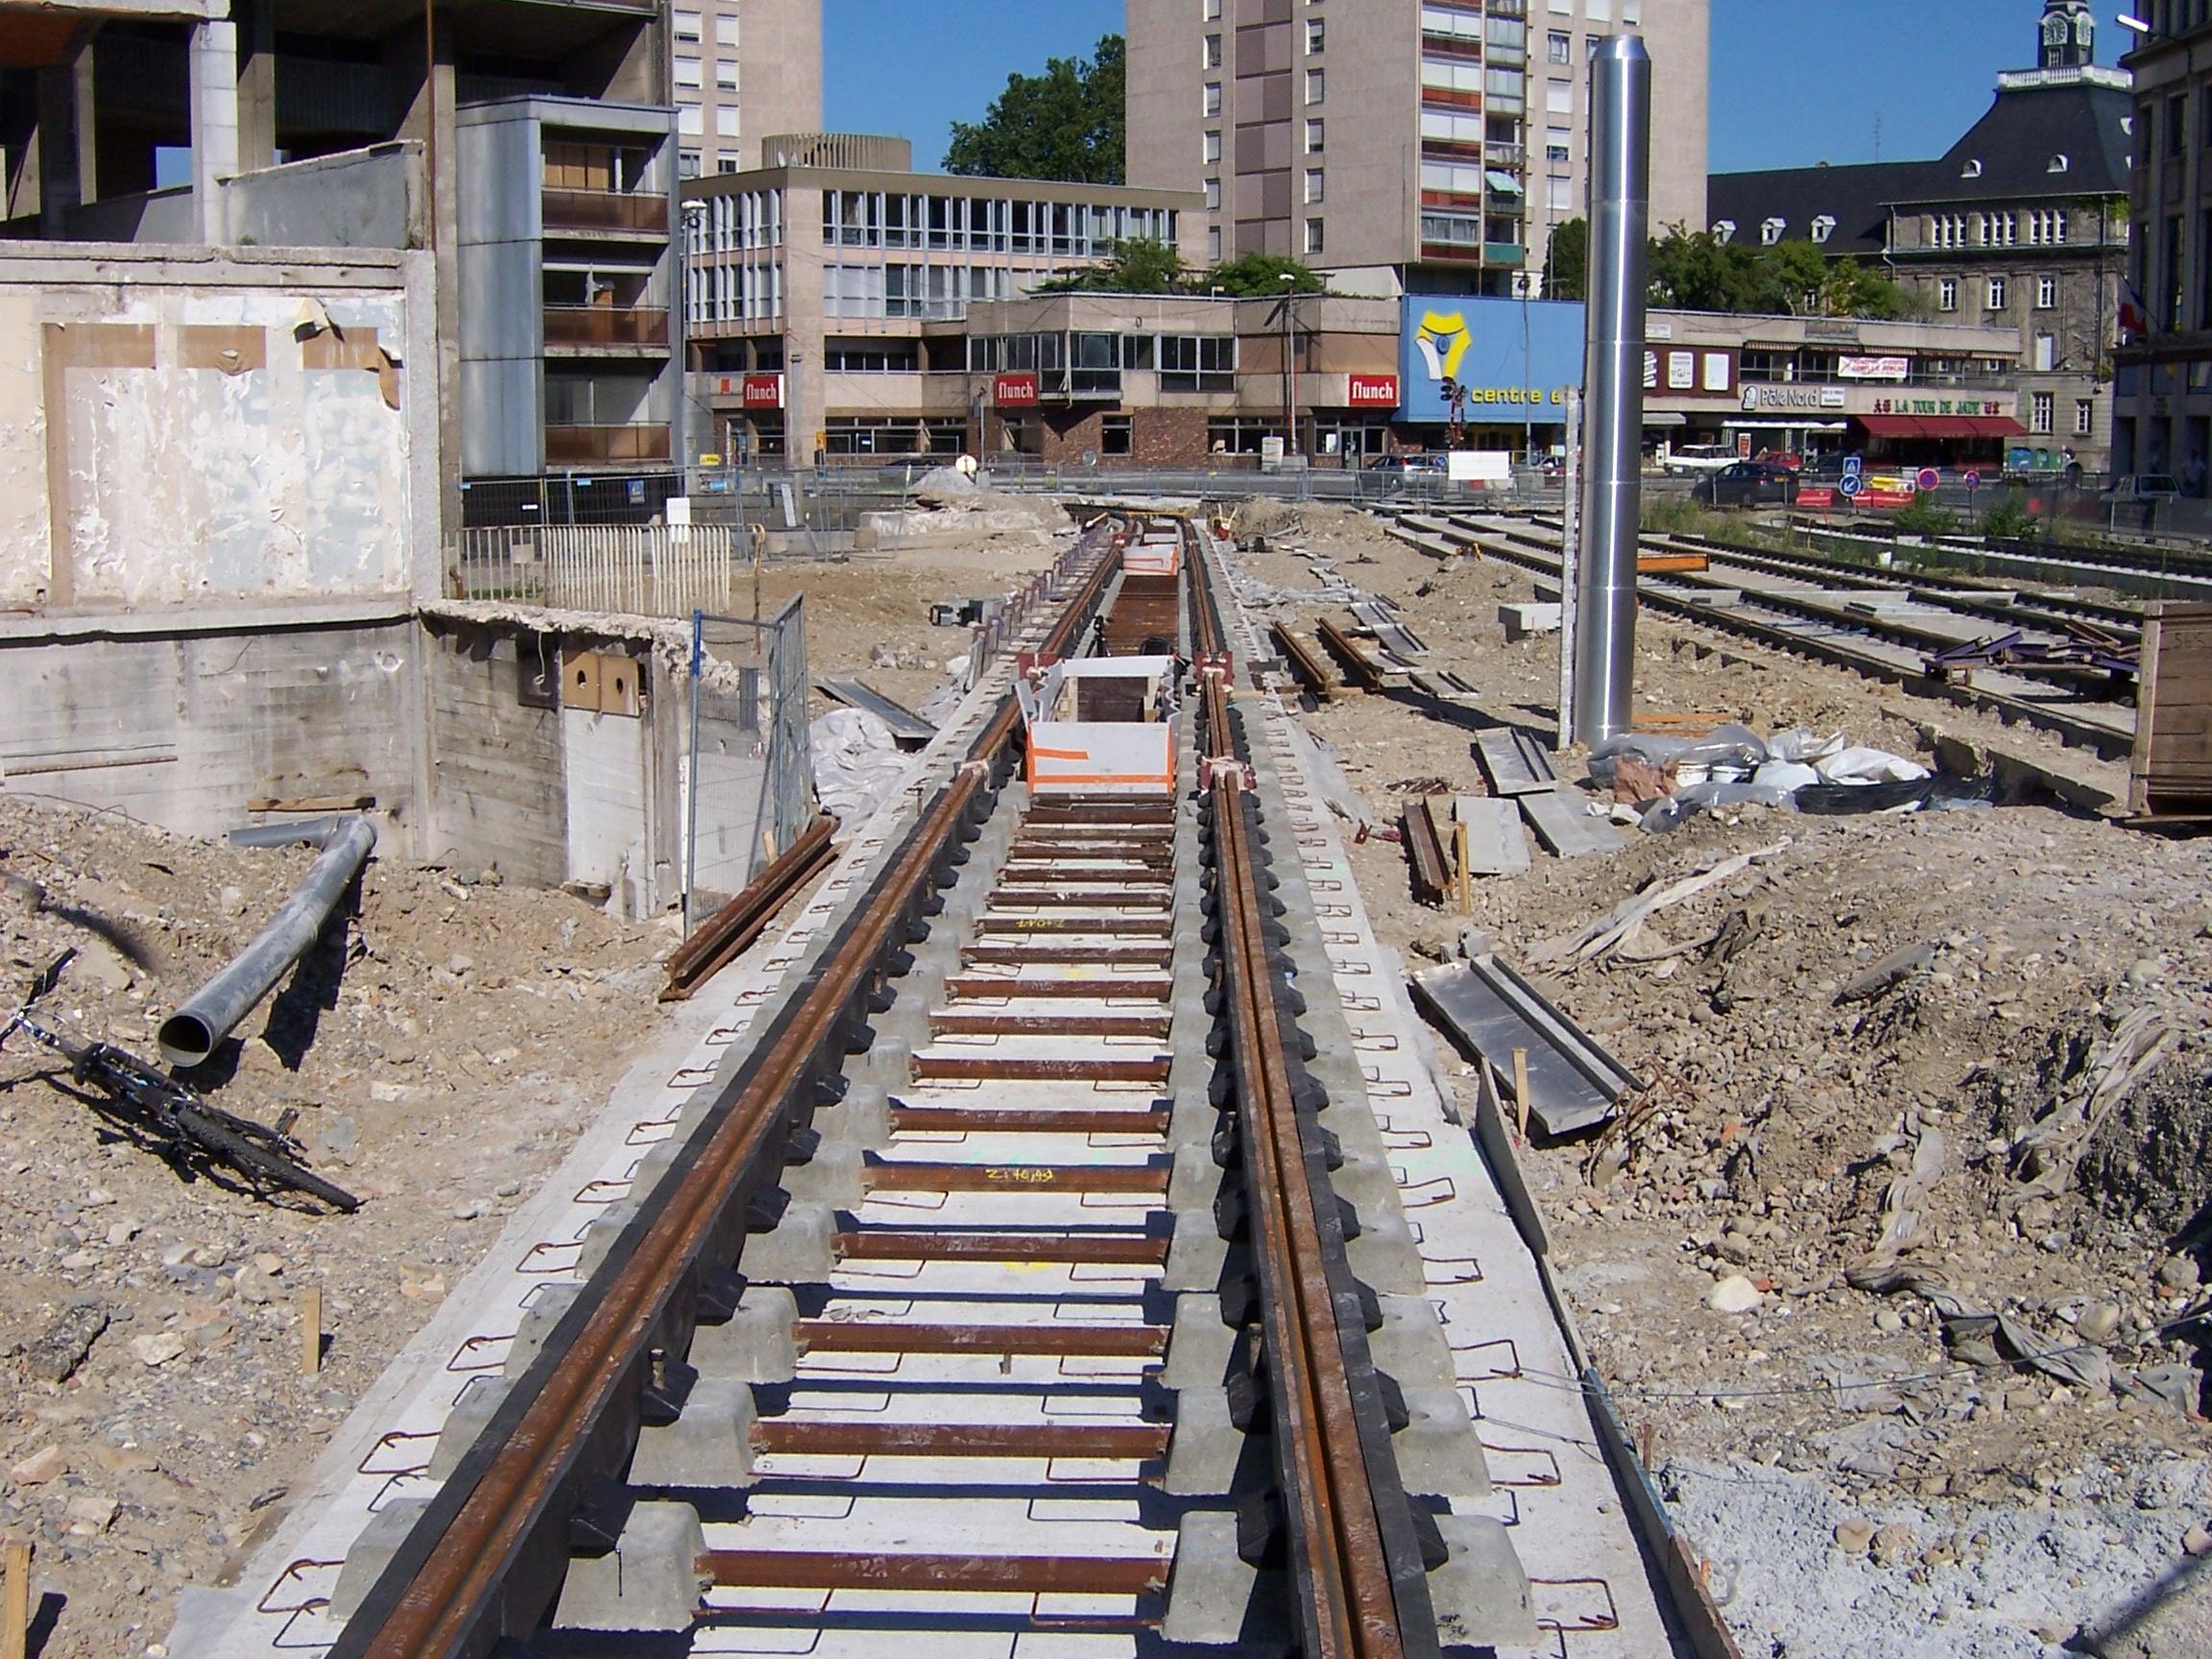 File Chantier Tram Mulhouse PorteJeune 14 07 2005 JPG Wikimedia